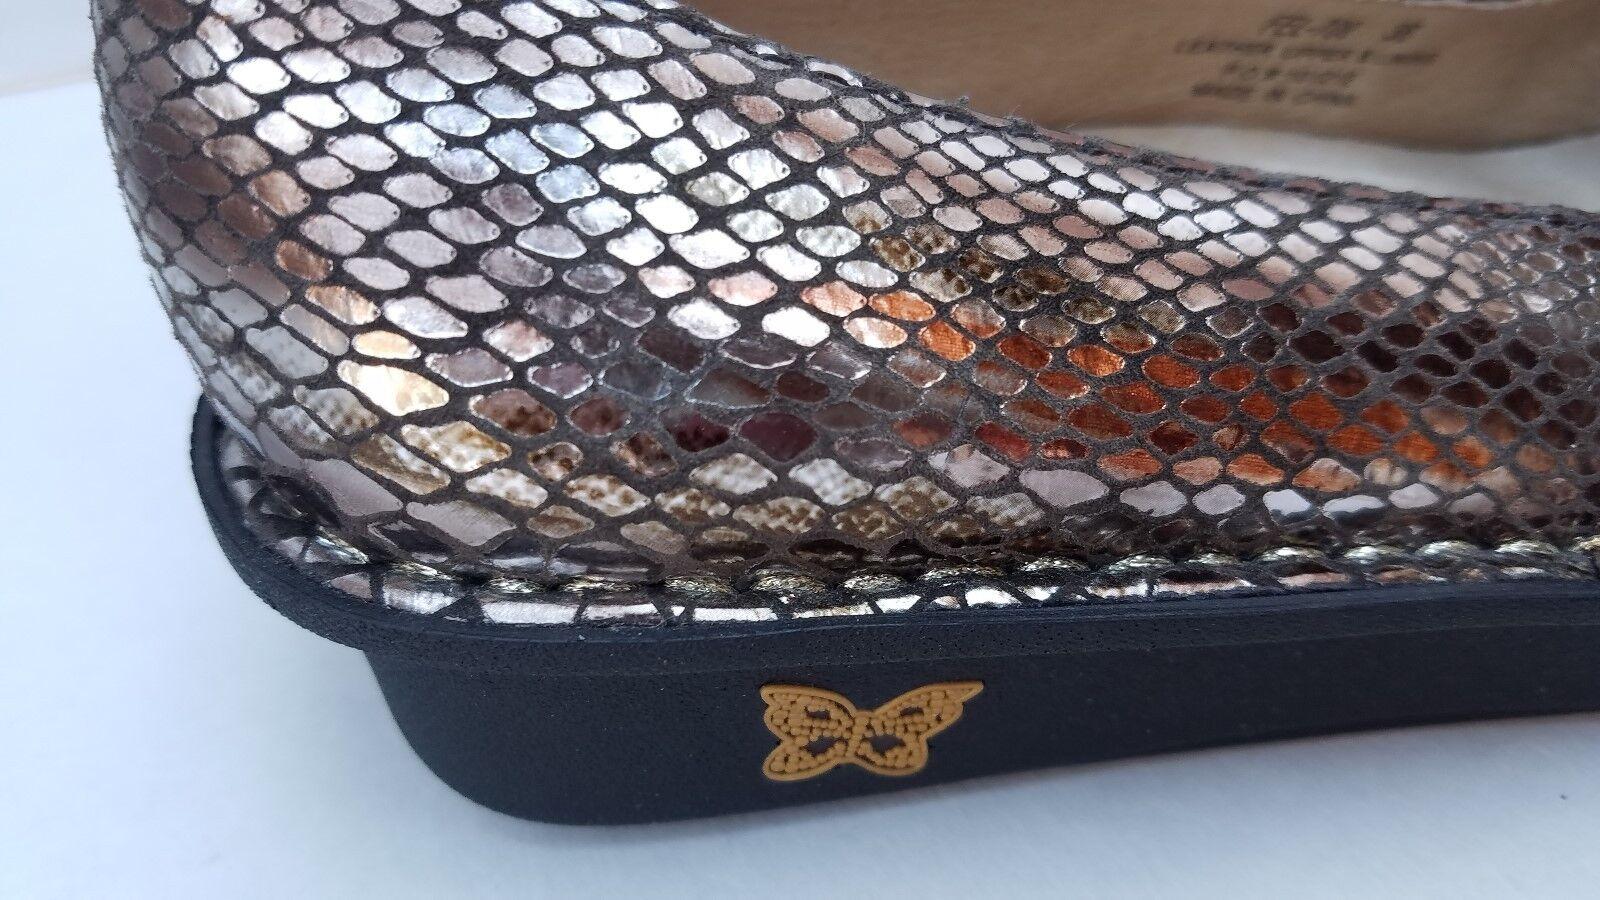 Alegria schuhe Feliz Mary Jane braun Silber Metallic Snakeskin Leather Leather Leather 36 FEL 709 b1b490